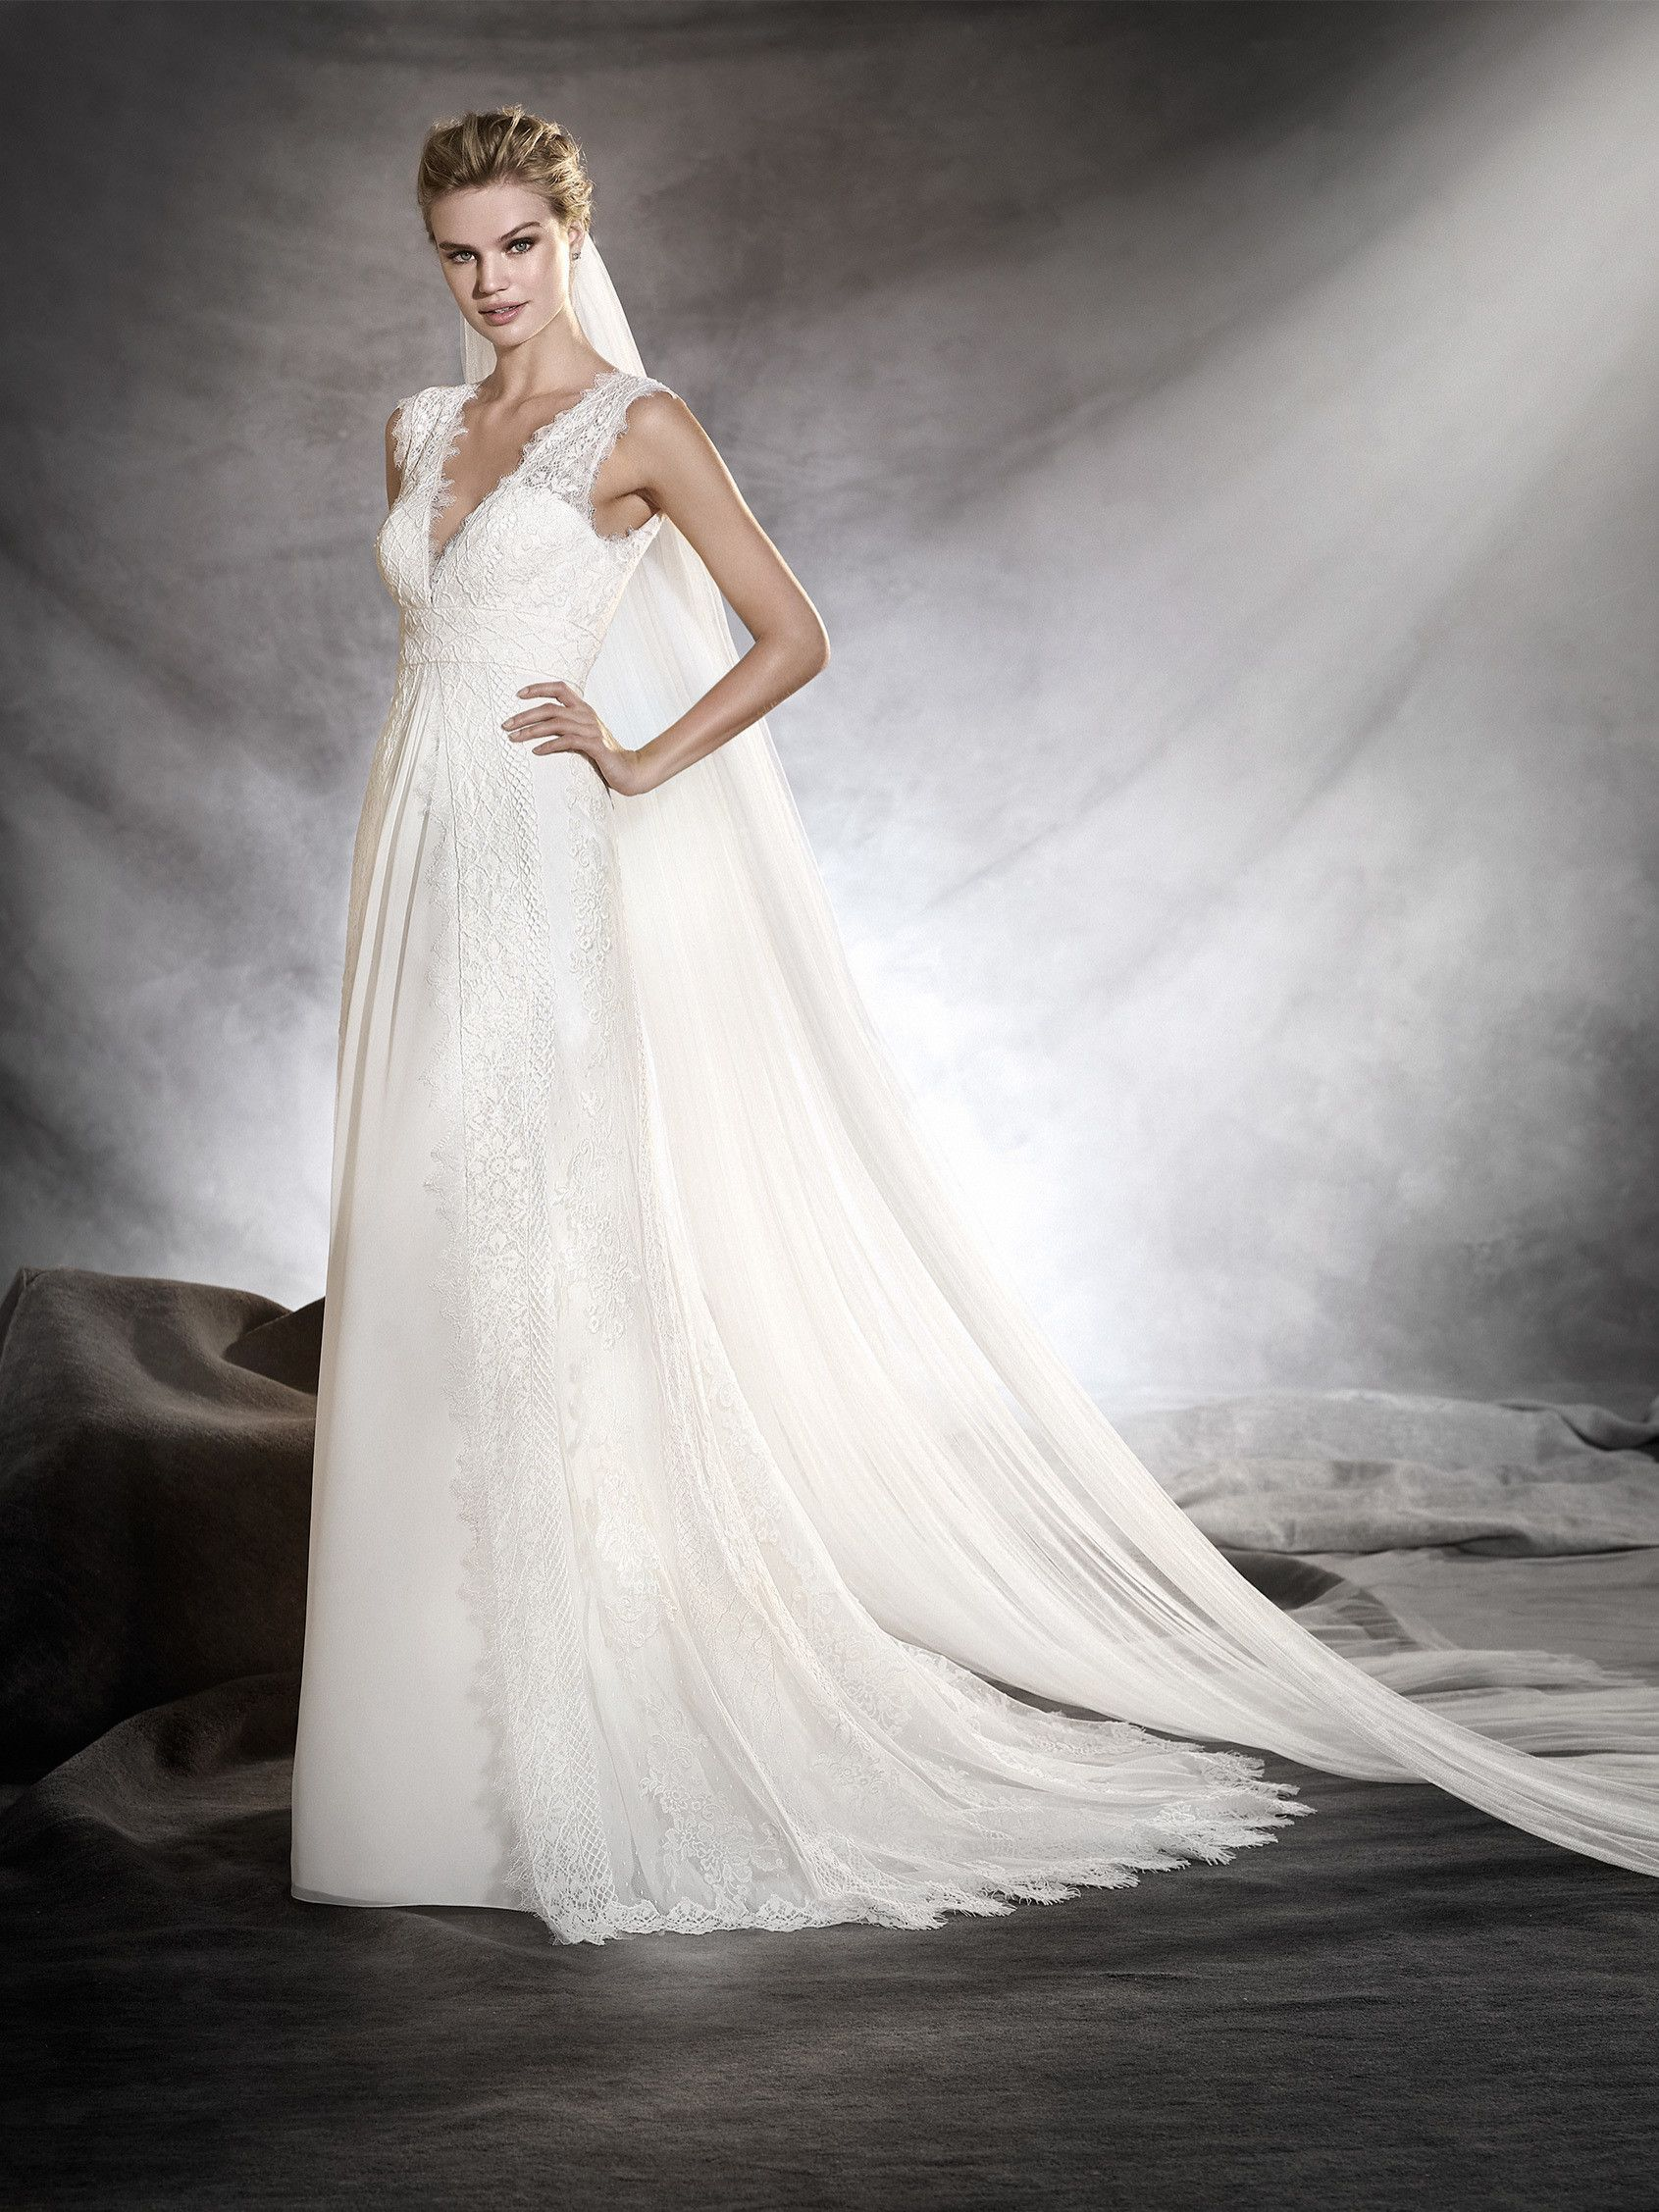 ODILIA - Ibiza-style, flared wedding dress | Jax\'s future wedding ...